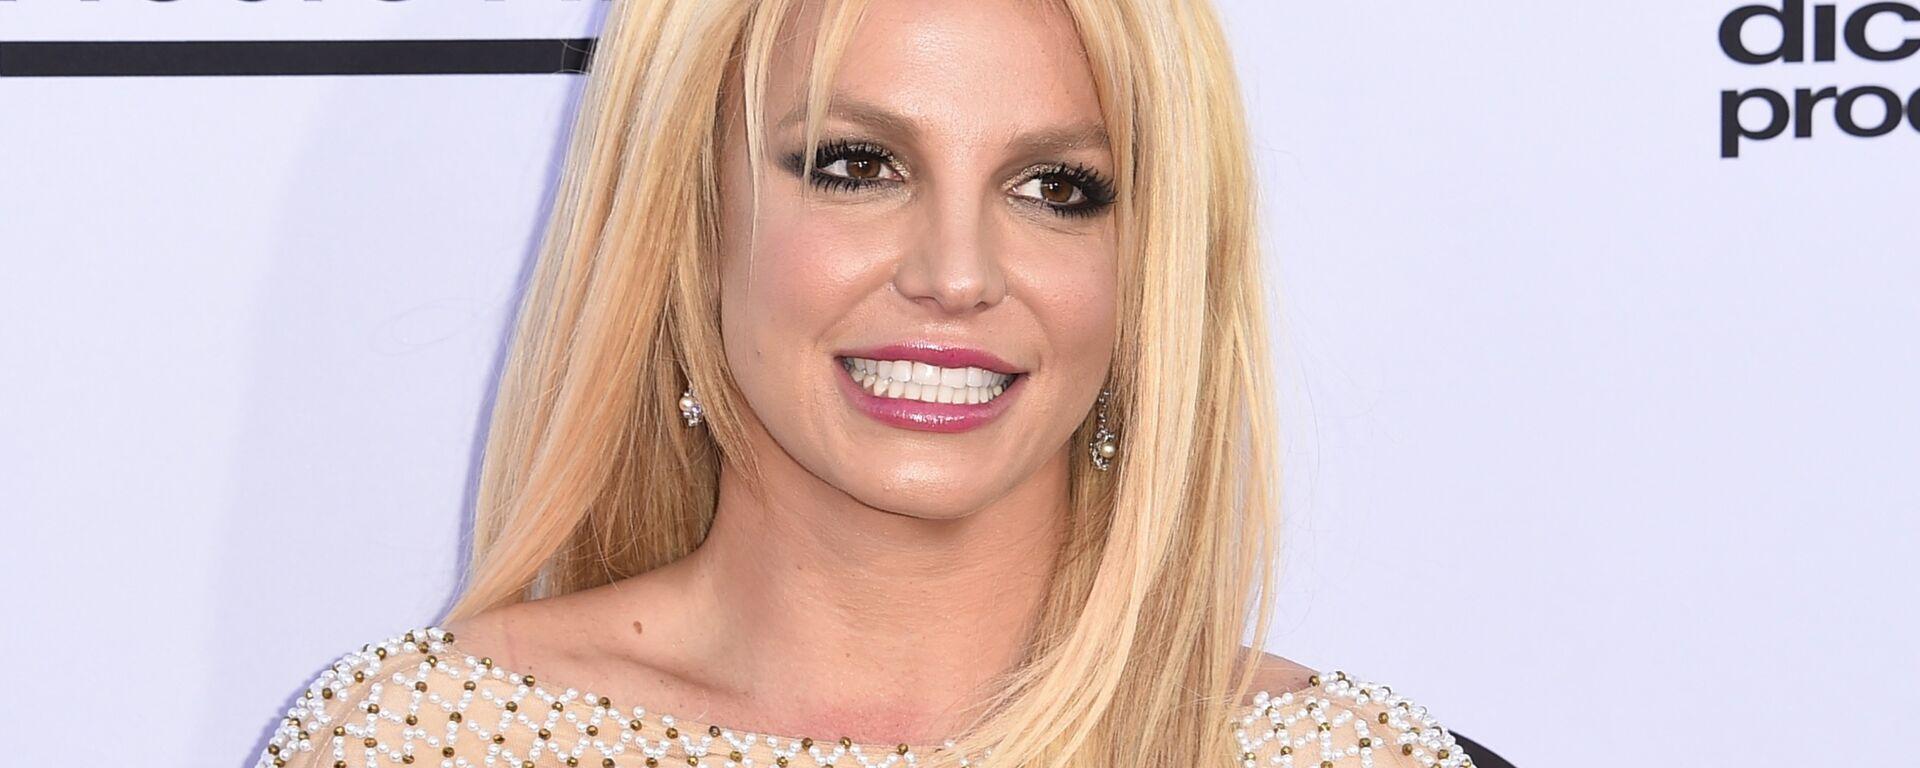 Britney Spears - Sputnik Mundo, 1920, 12.06.2019